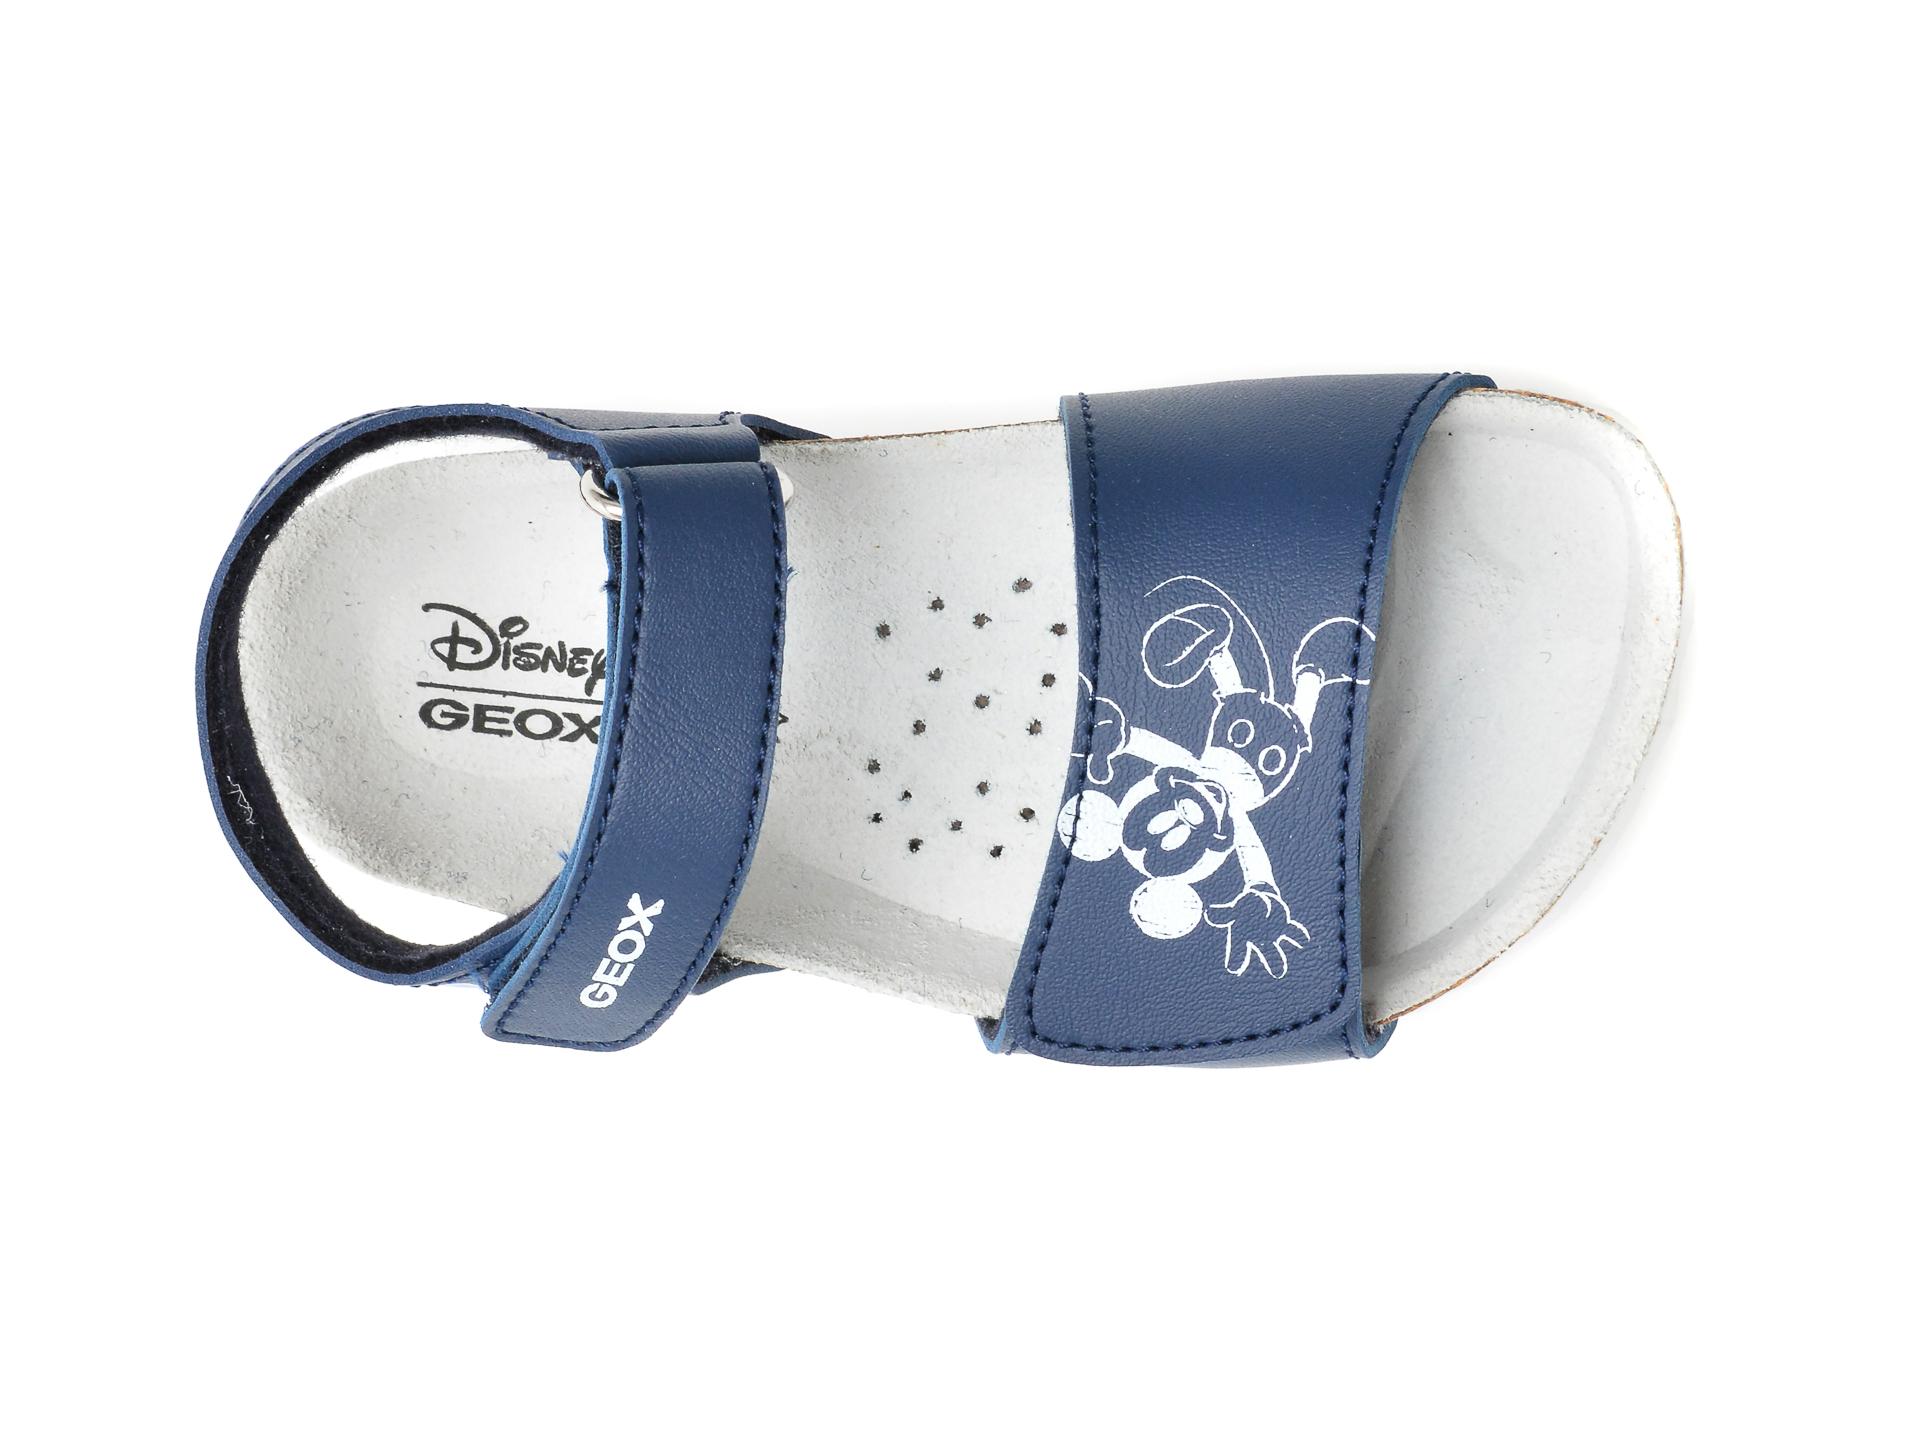 Sandale GEOX albastre, B152QC, din piele ecologica - 6